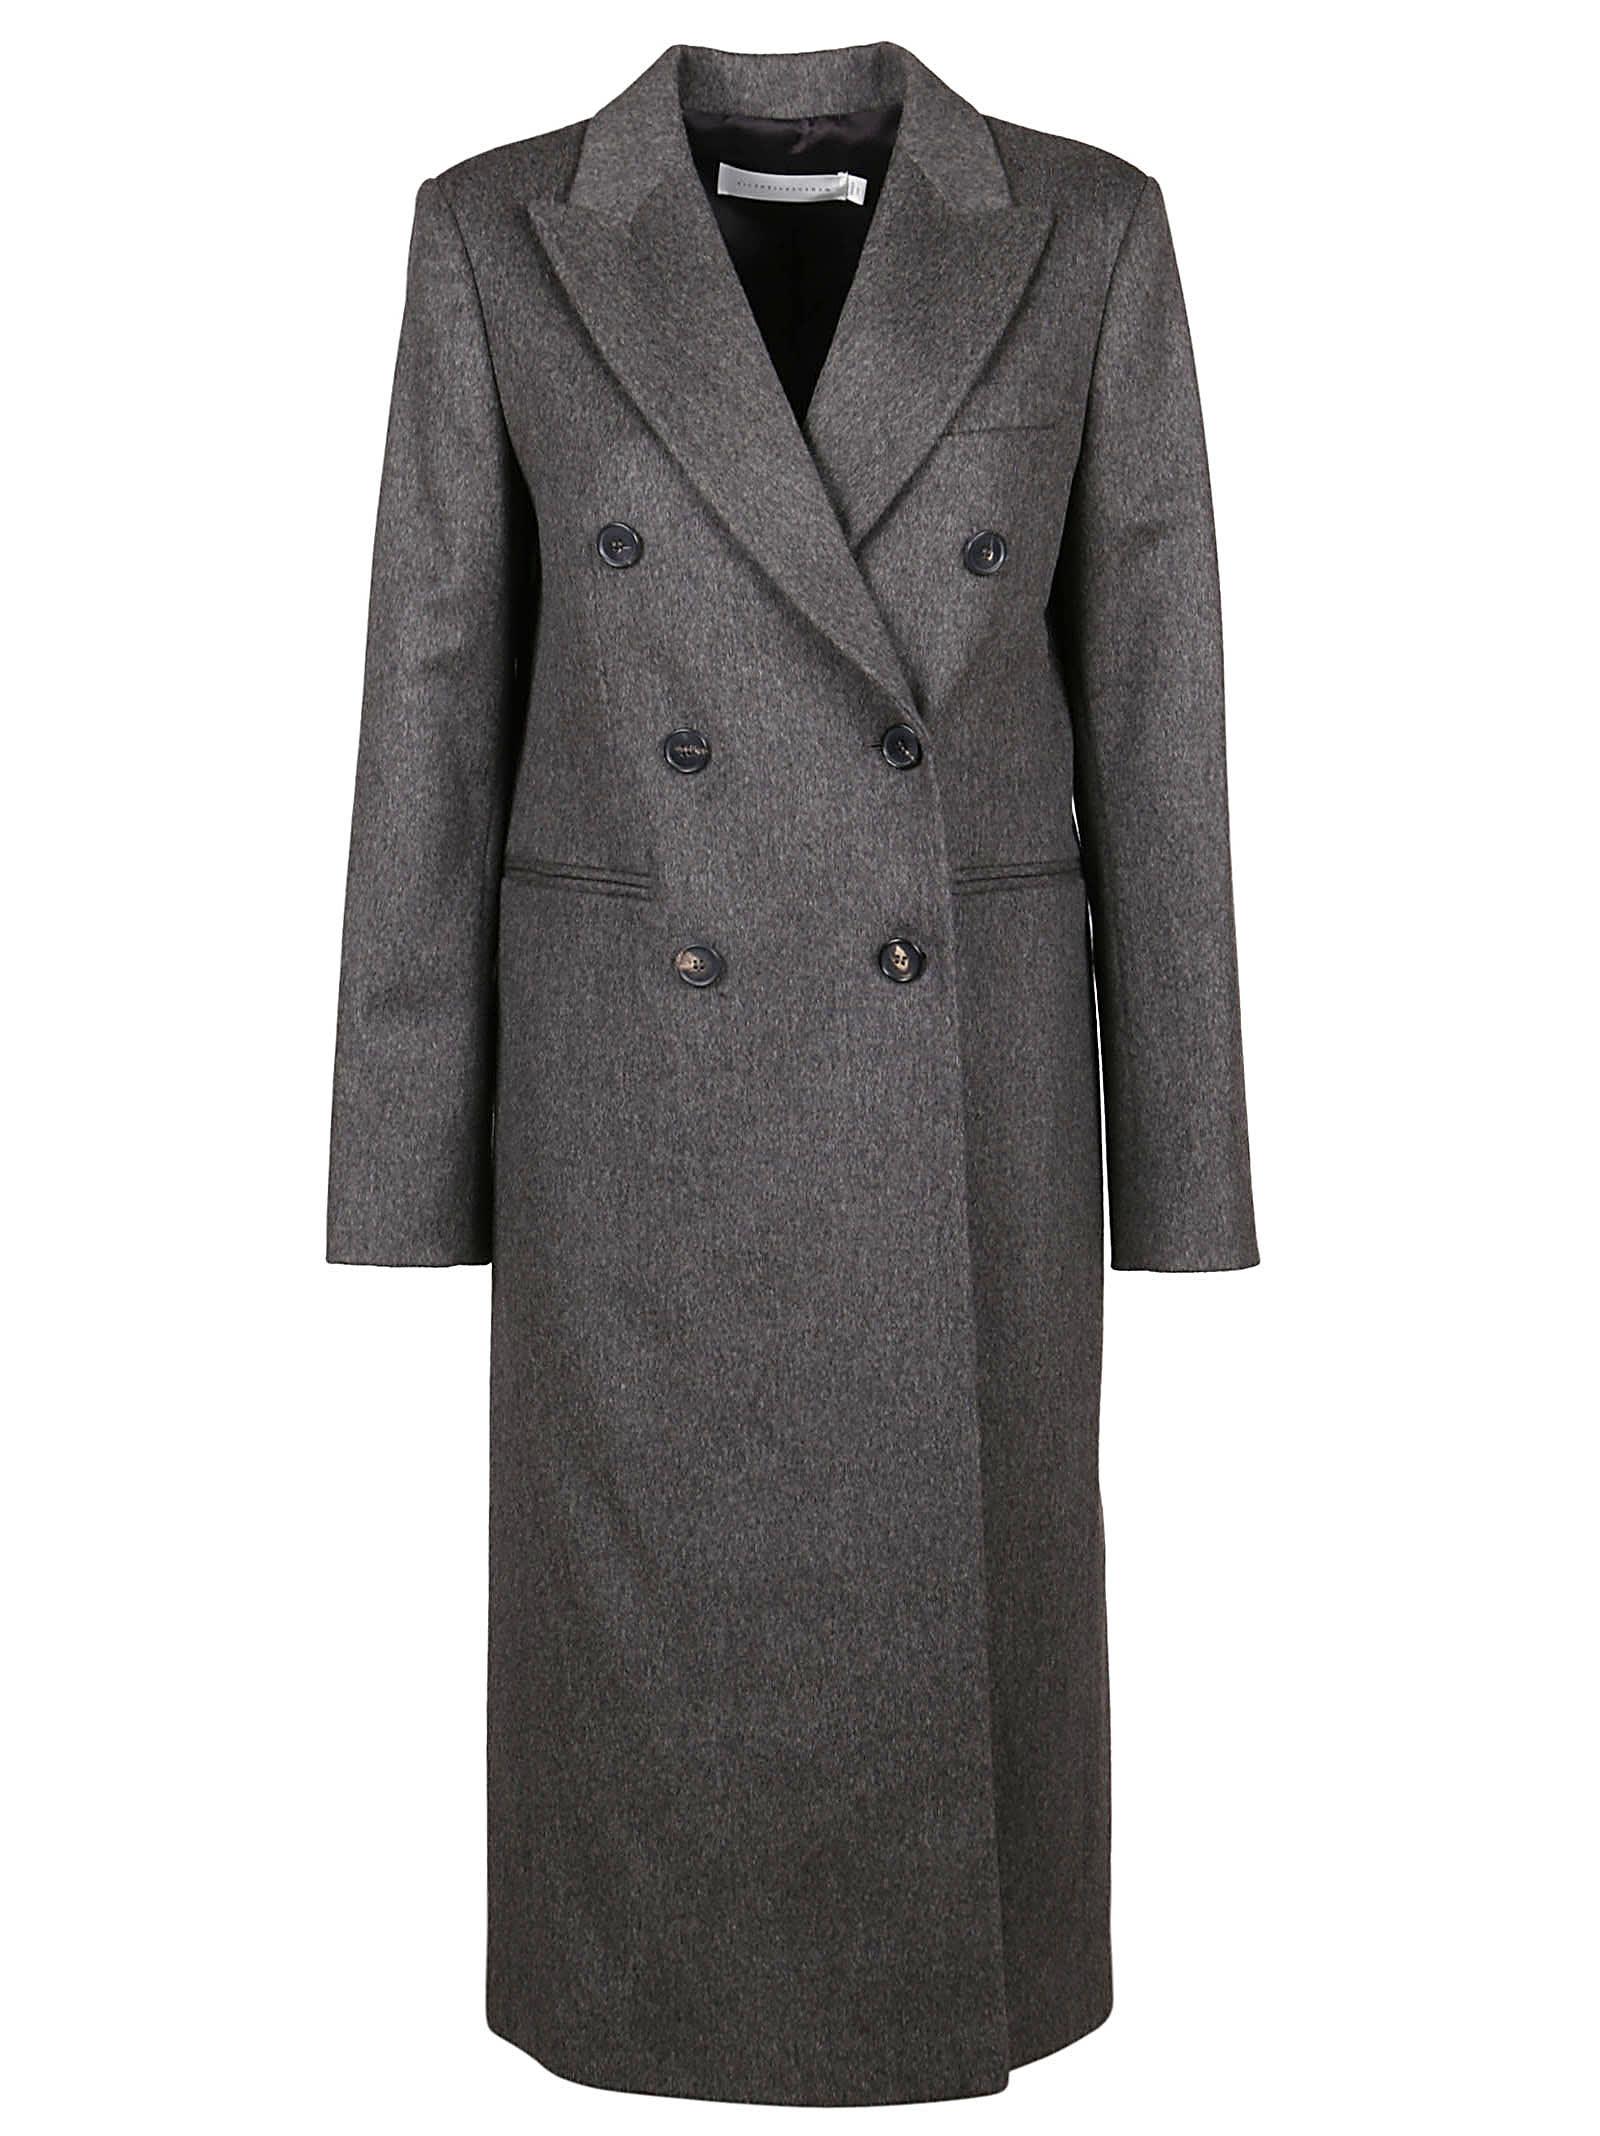 Photo of  Victoria Beckham Cappotto- shop Victoria Beckham jackets online sales